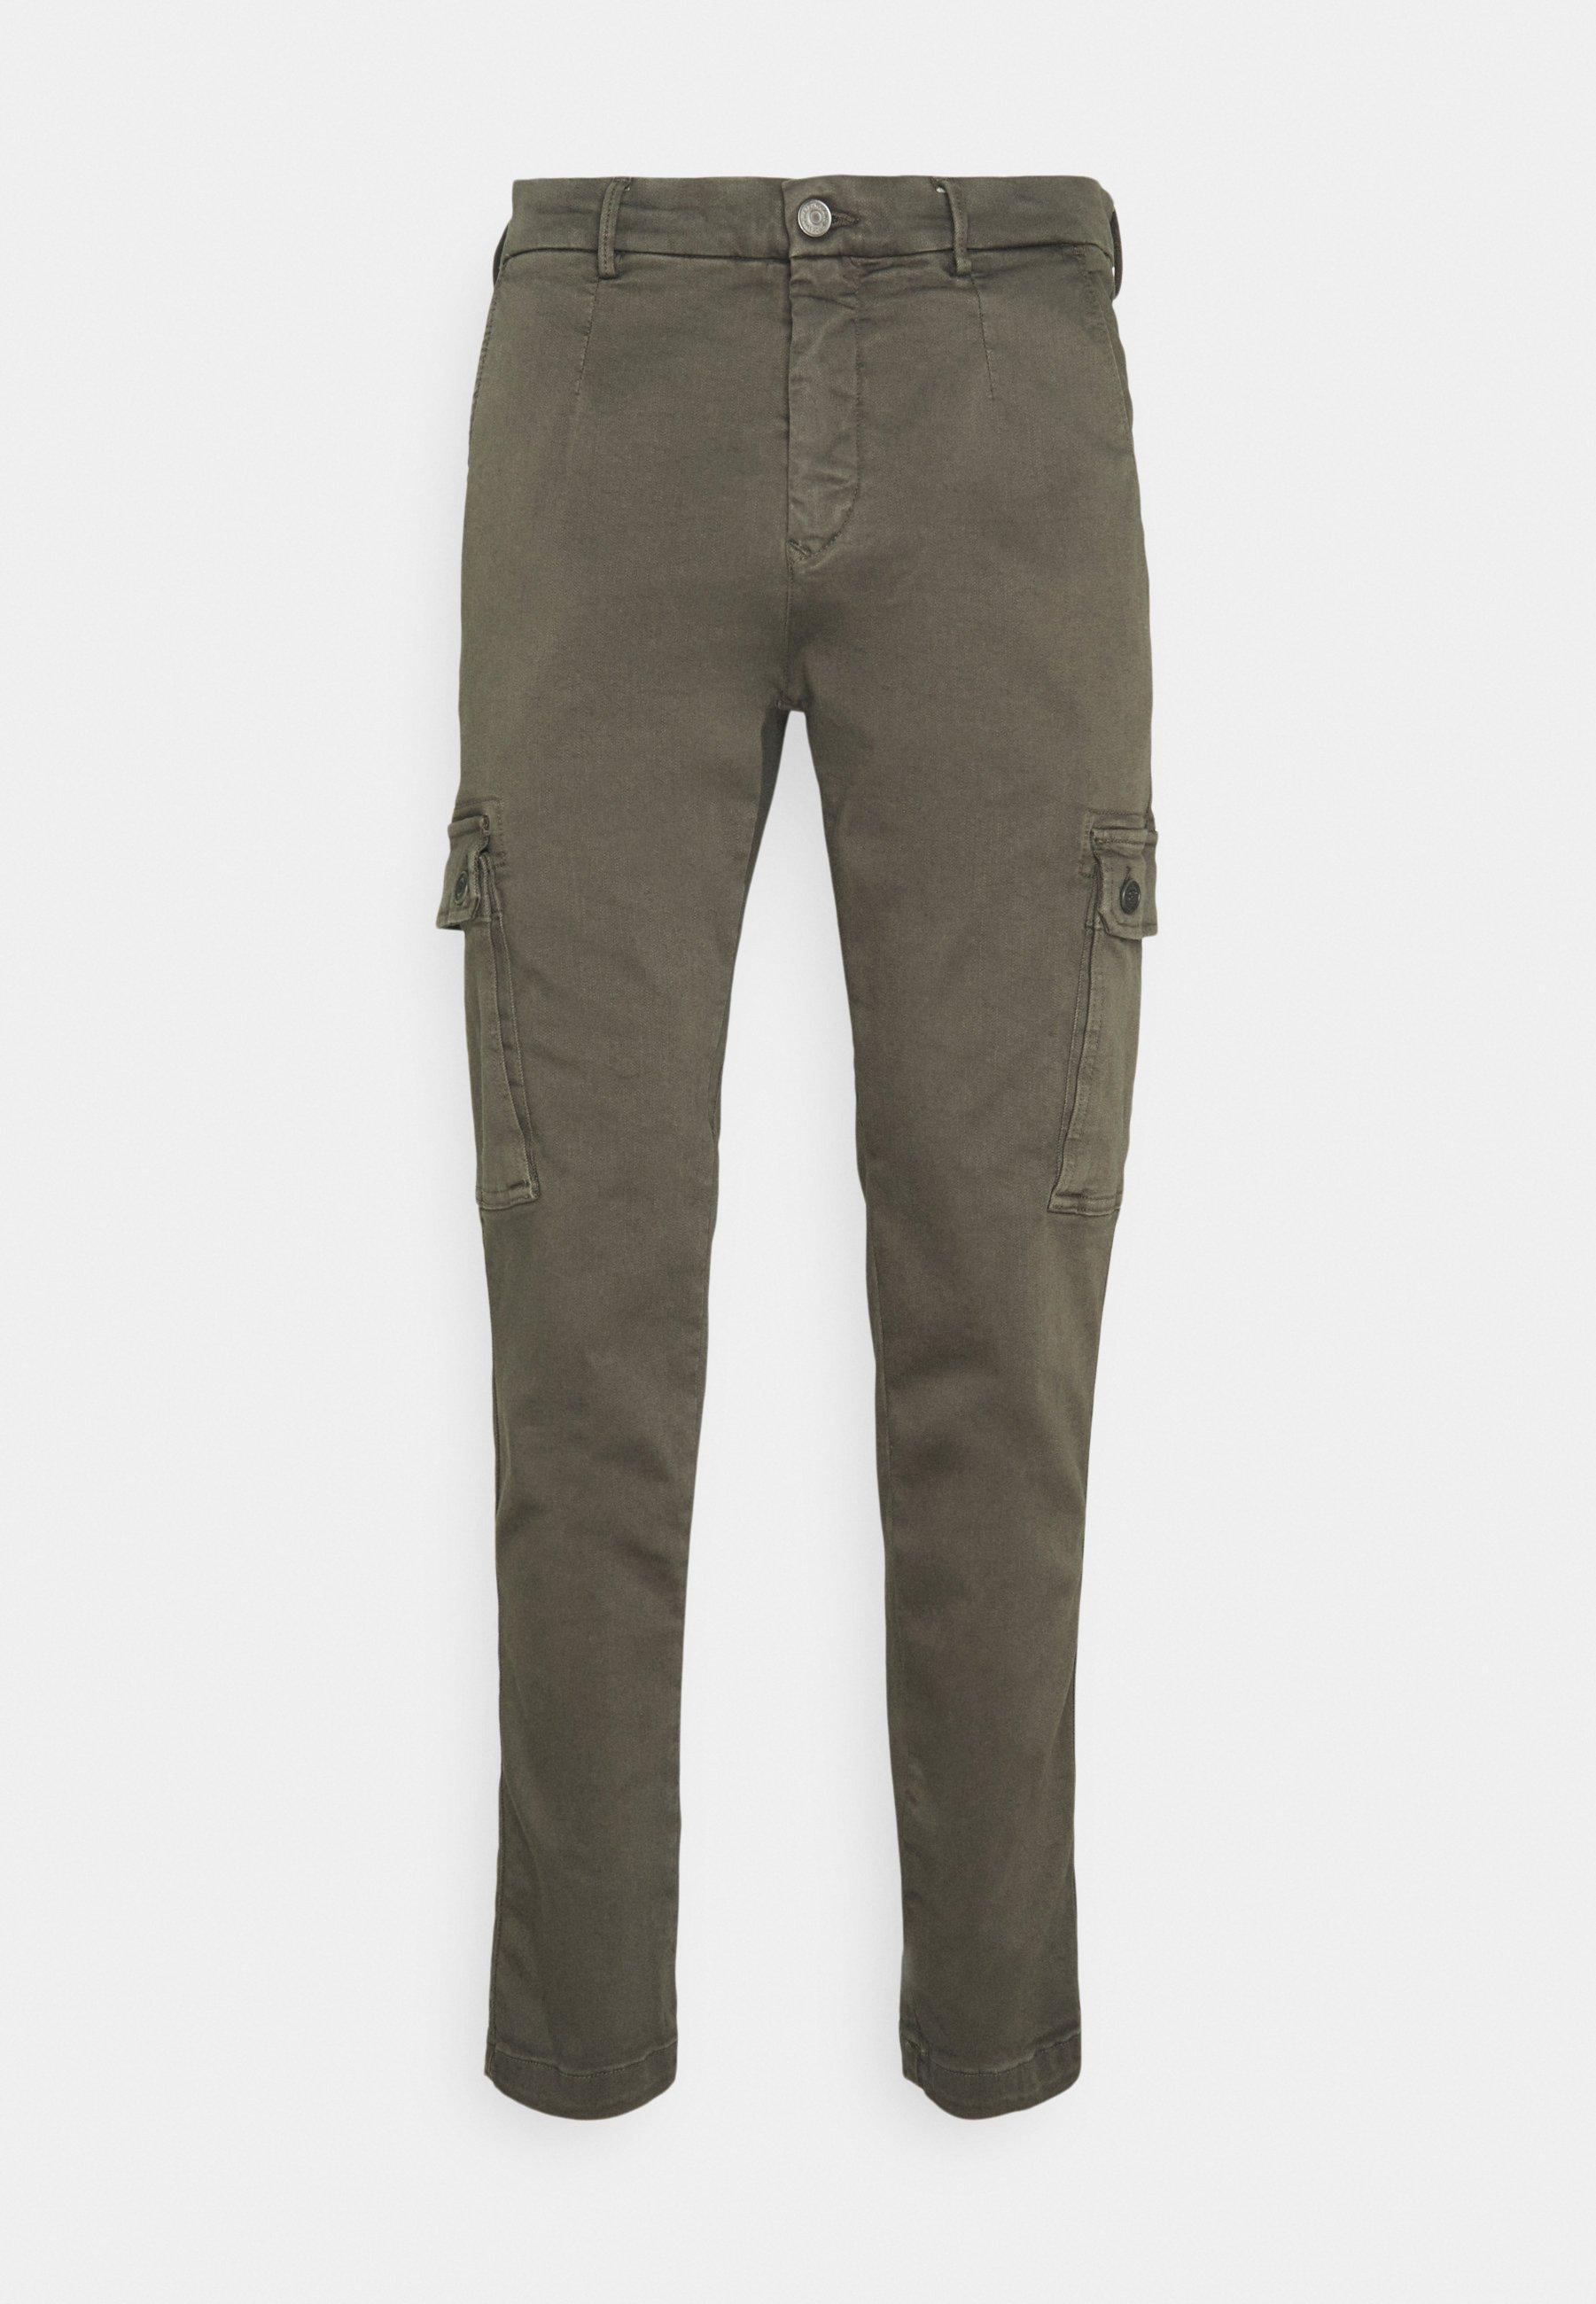 Homme JAAN HYPERCARGO - Pantalon cargo